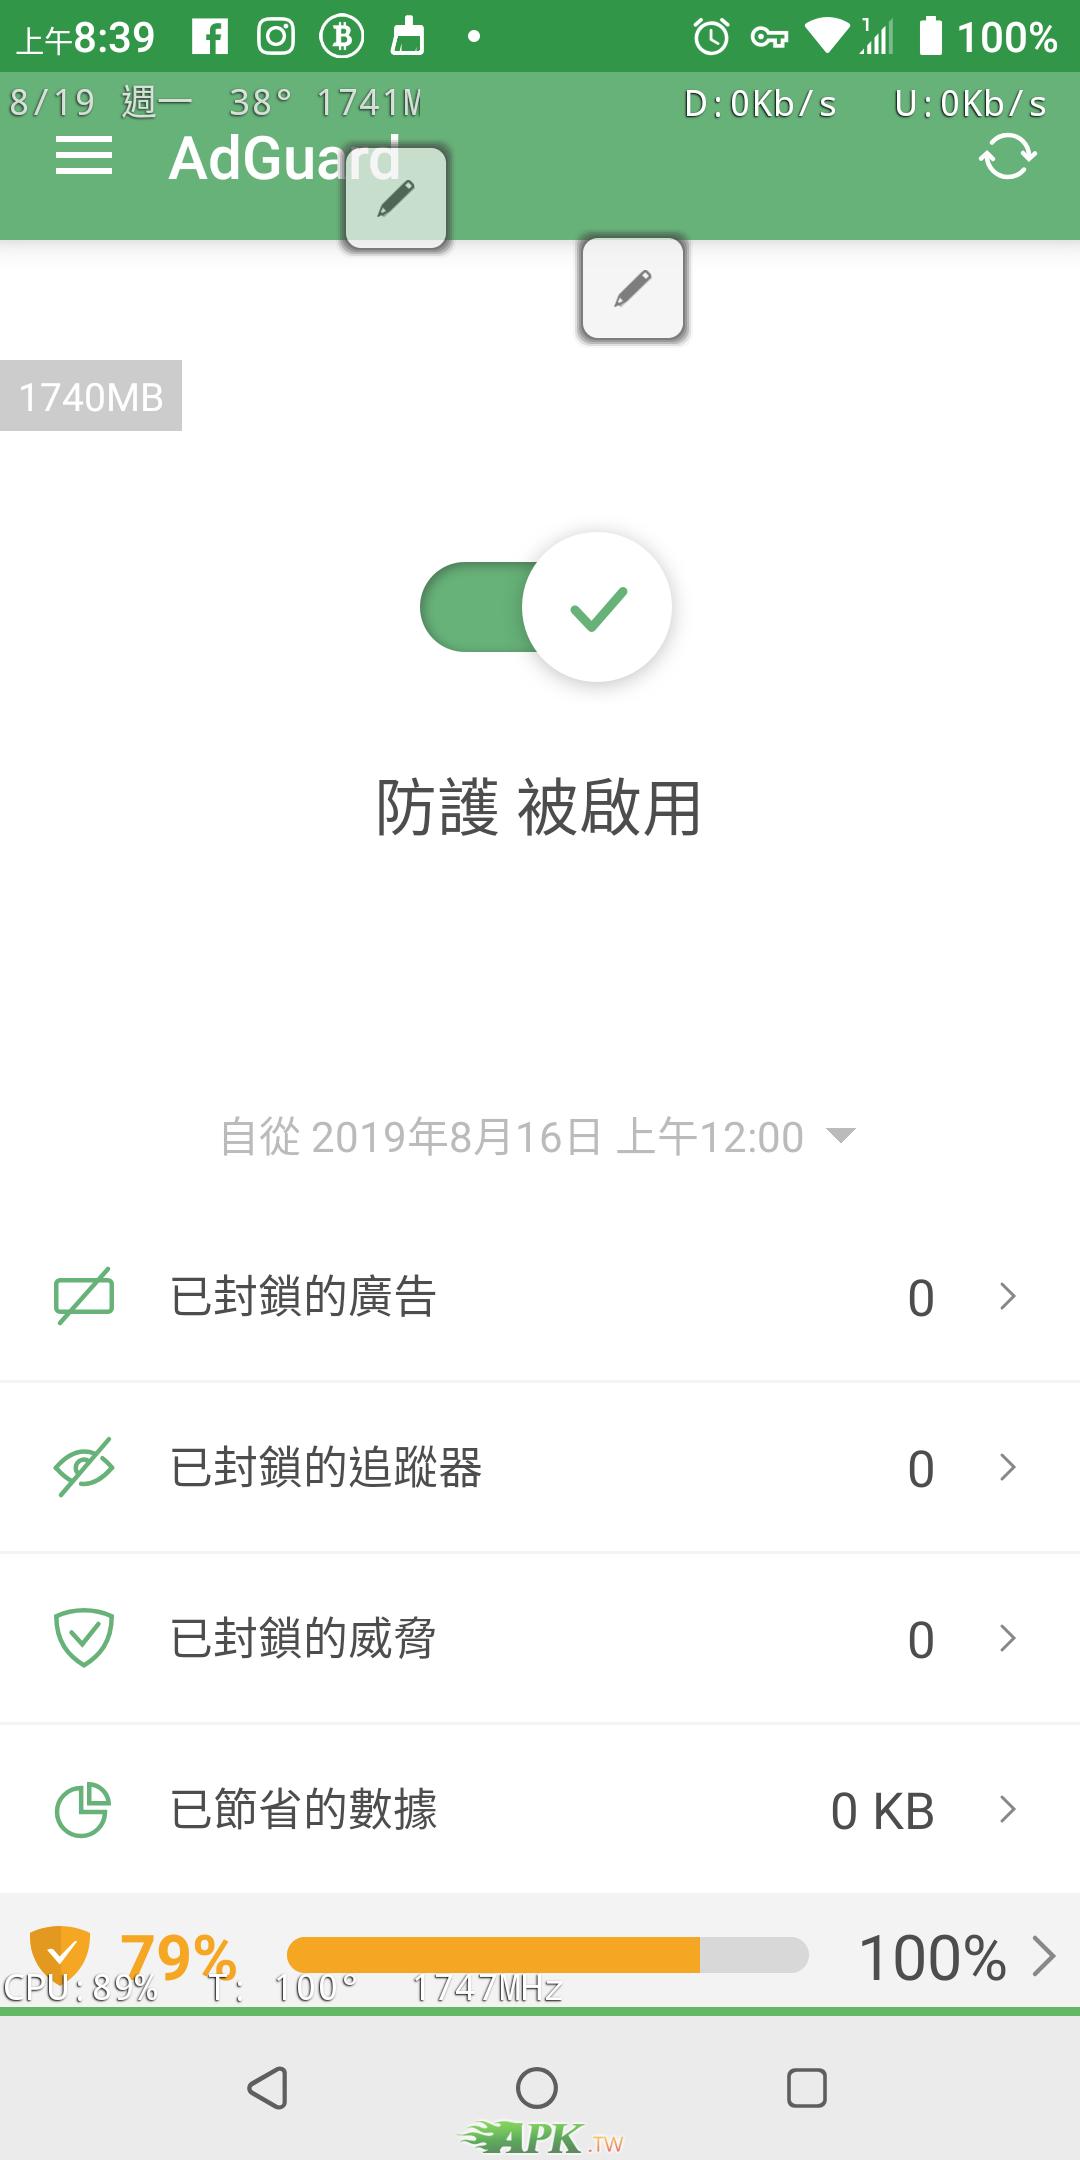 Screenshot_20190819-083951.png